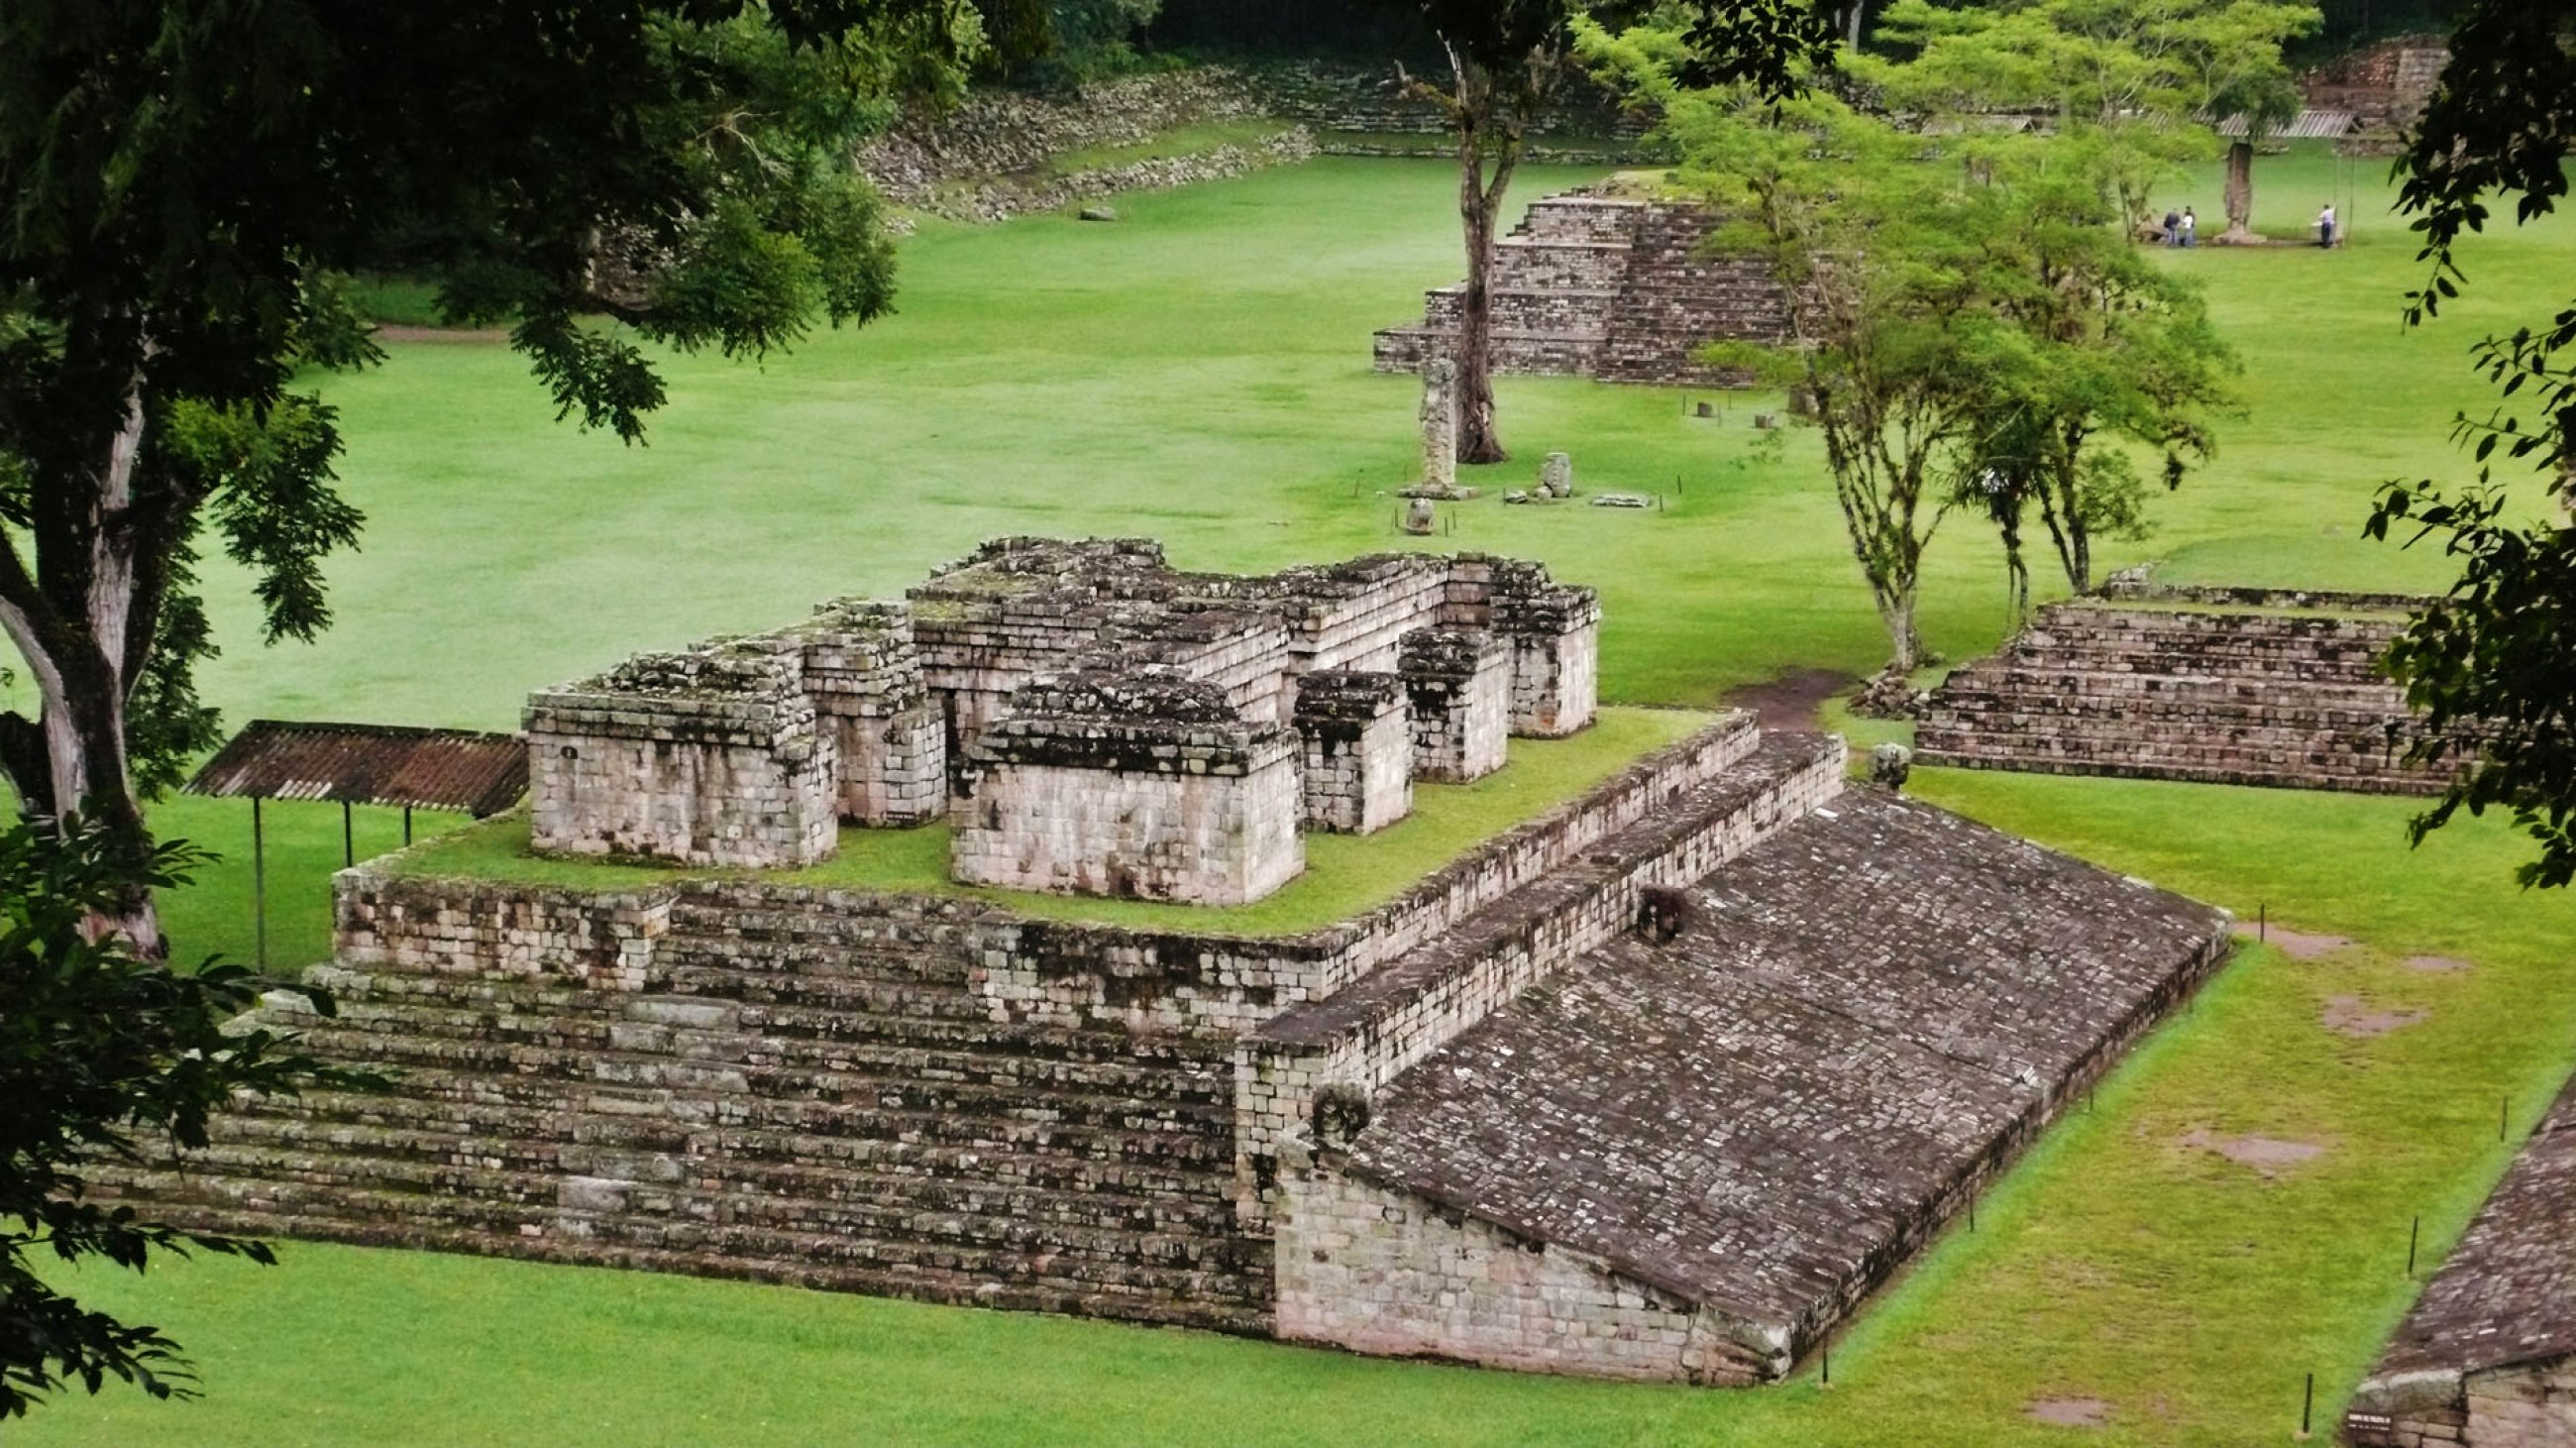 https://bubo.sk/uploads/galleries/7388/honduras-copan-temple-of-structure-4-in-the-copan-ruinas.jpg